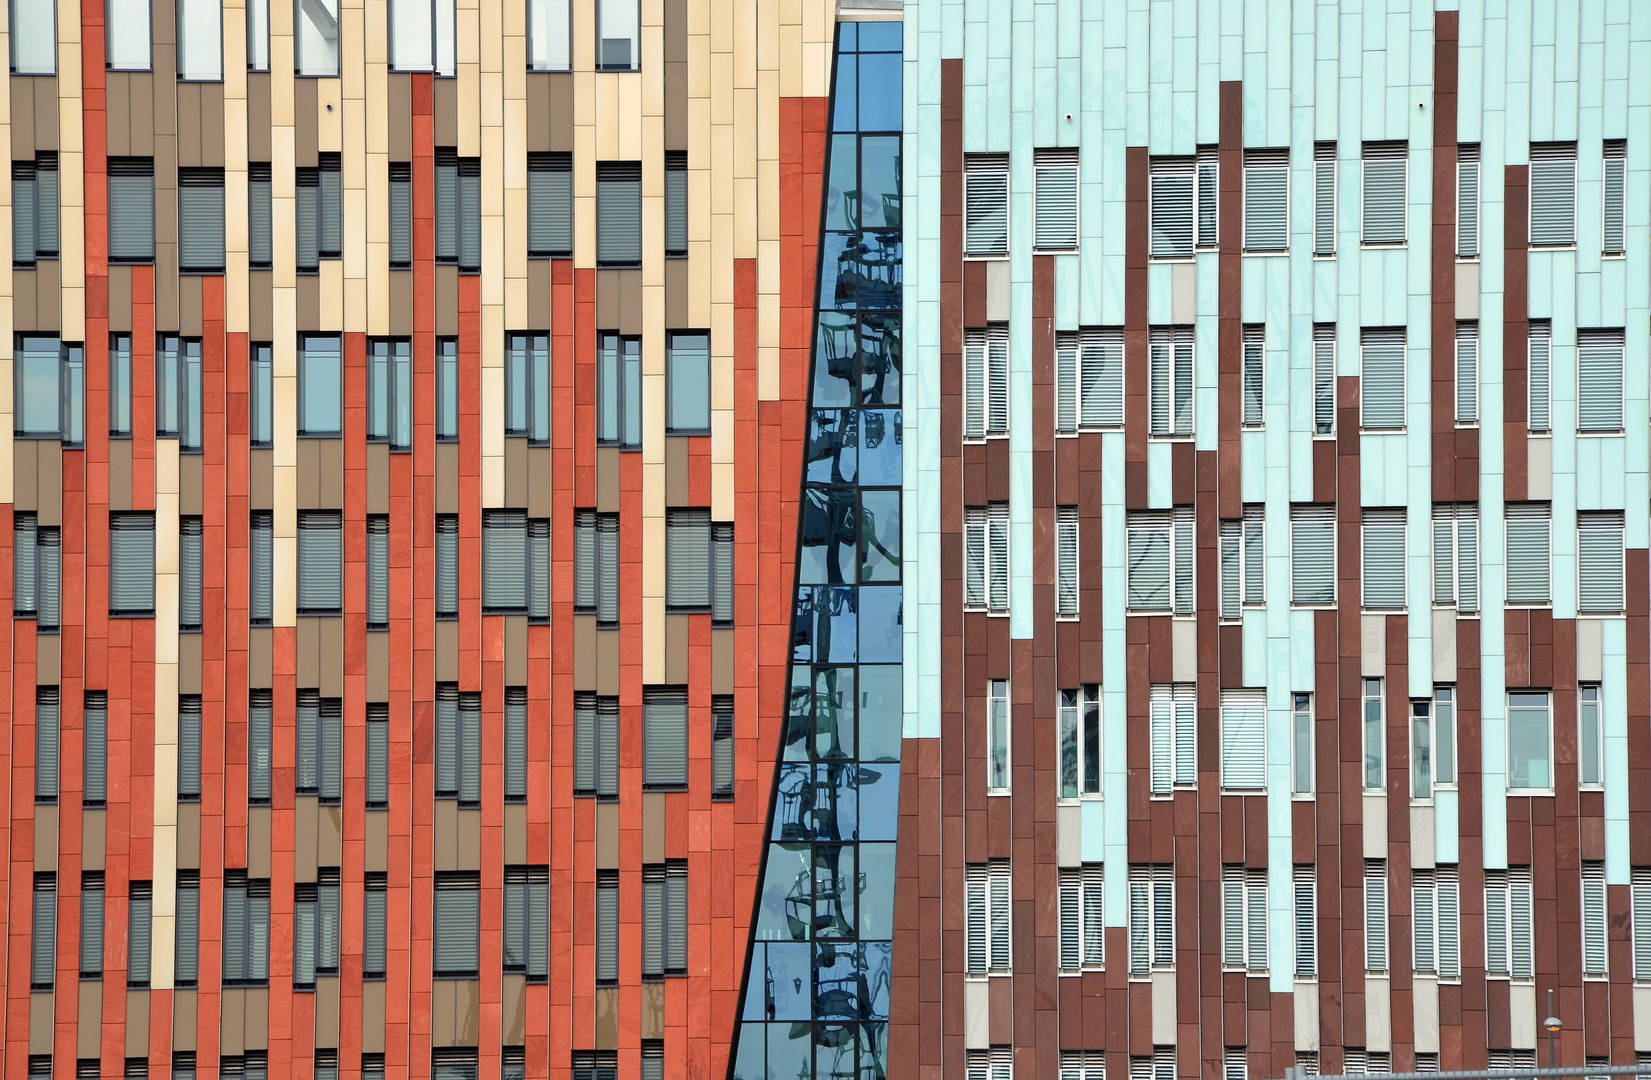 Riesenrad Hamburg/The Sumatra building